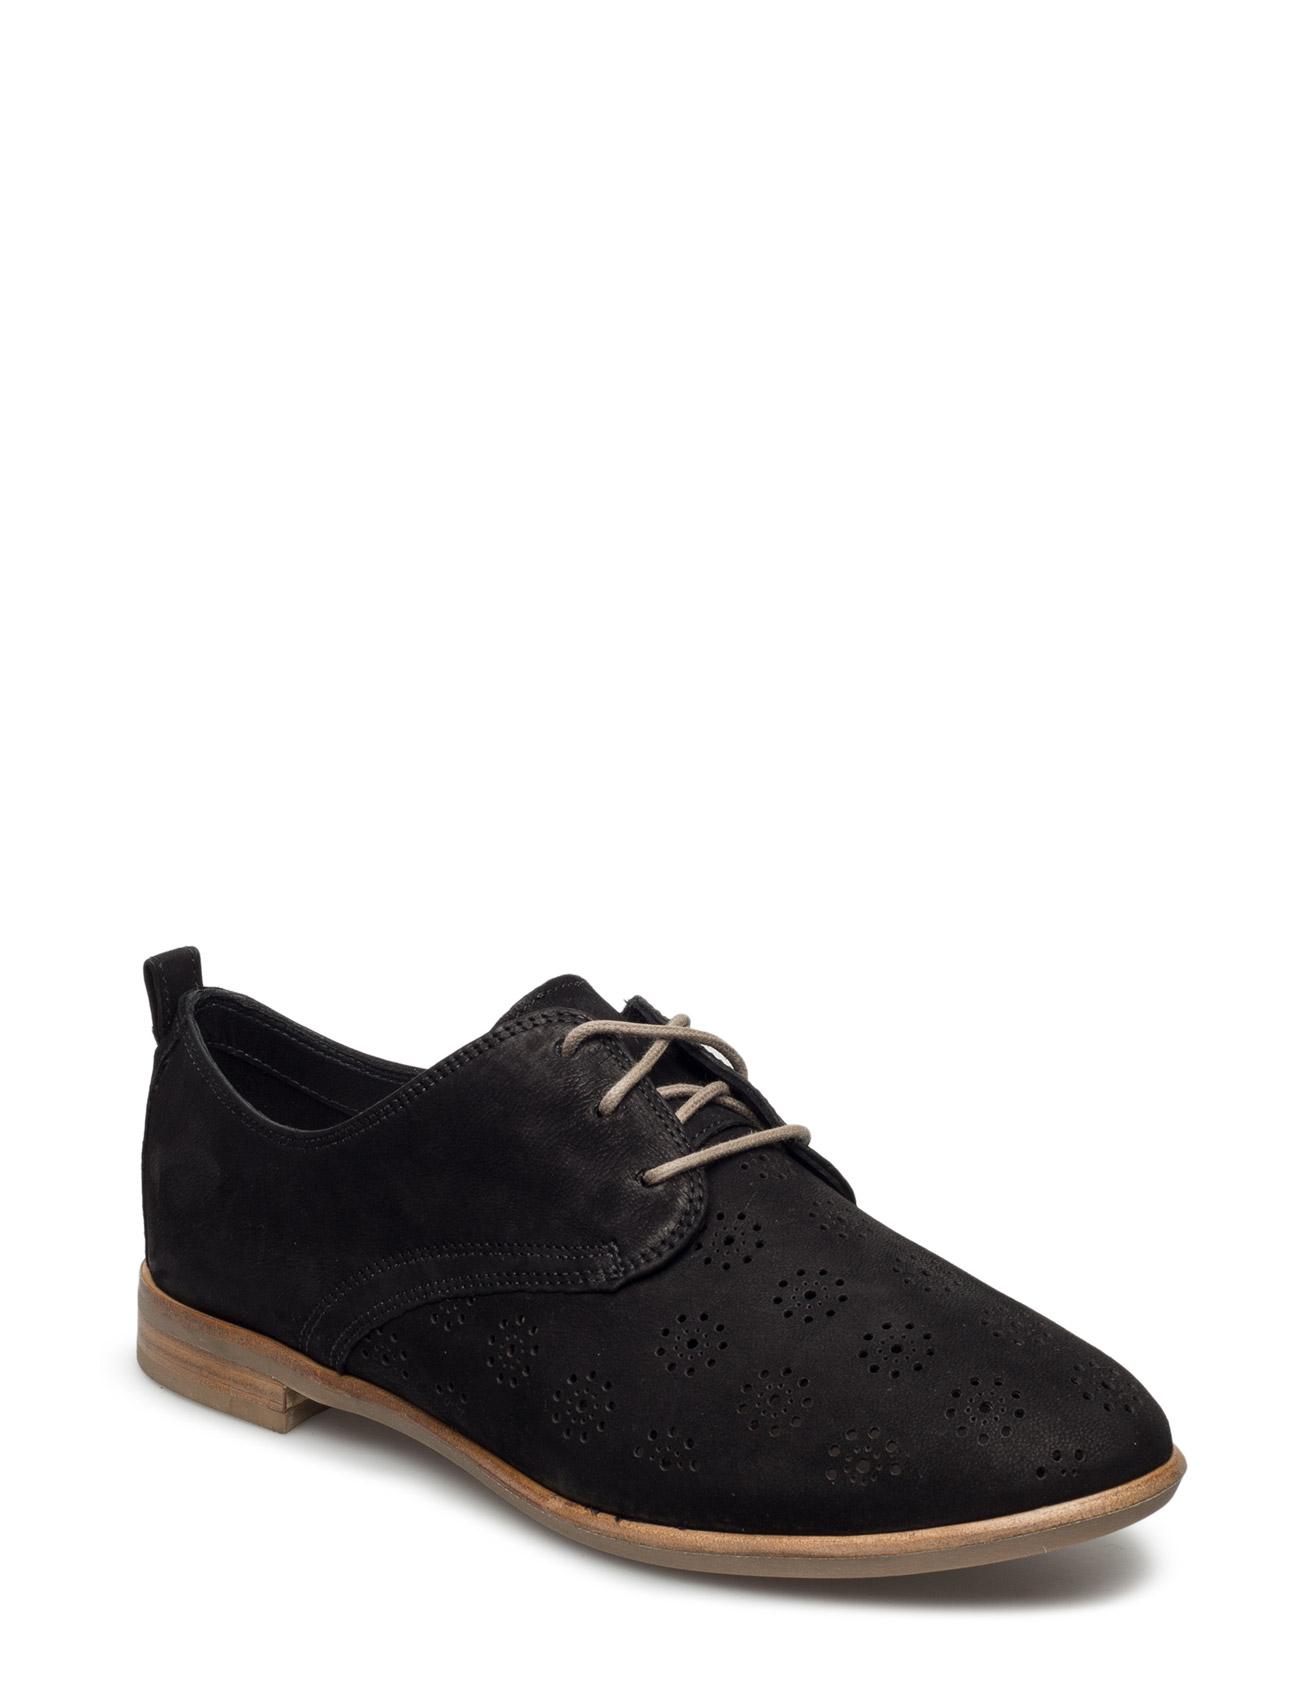 Alania Posey Clarks Flade sko til Damer i Sort